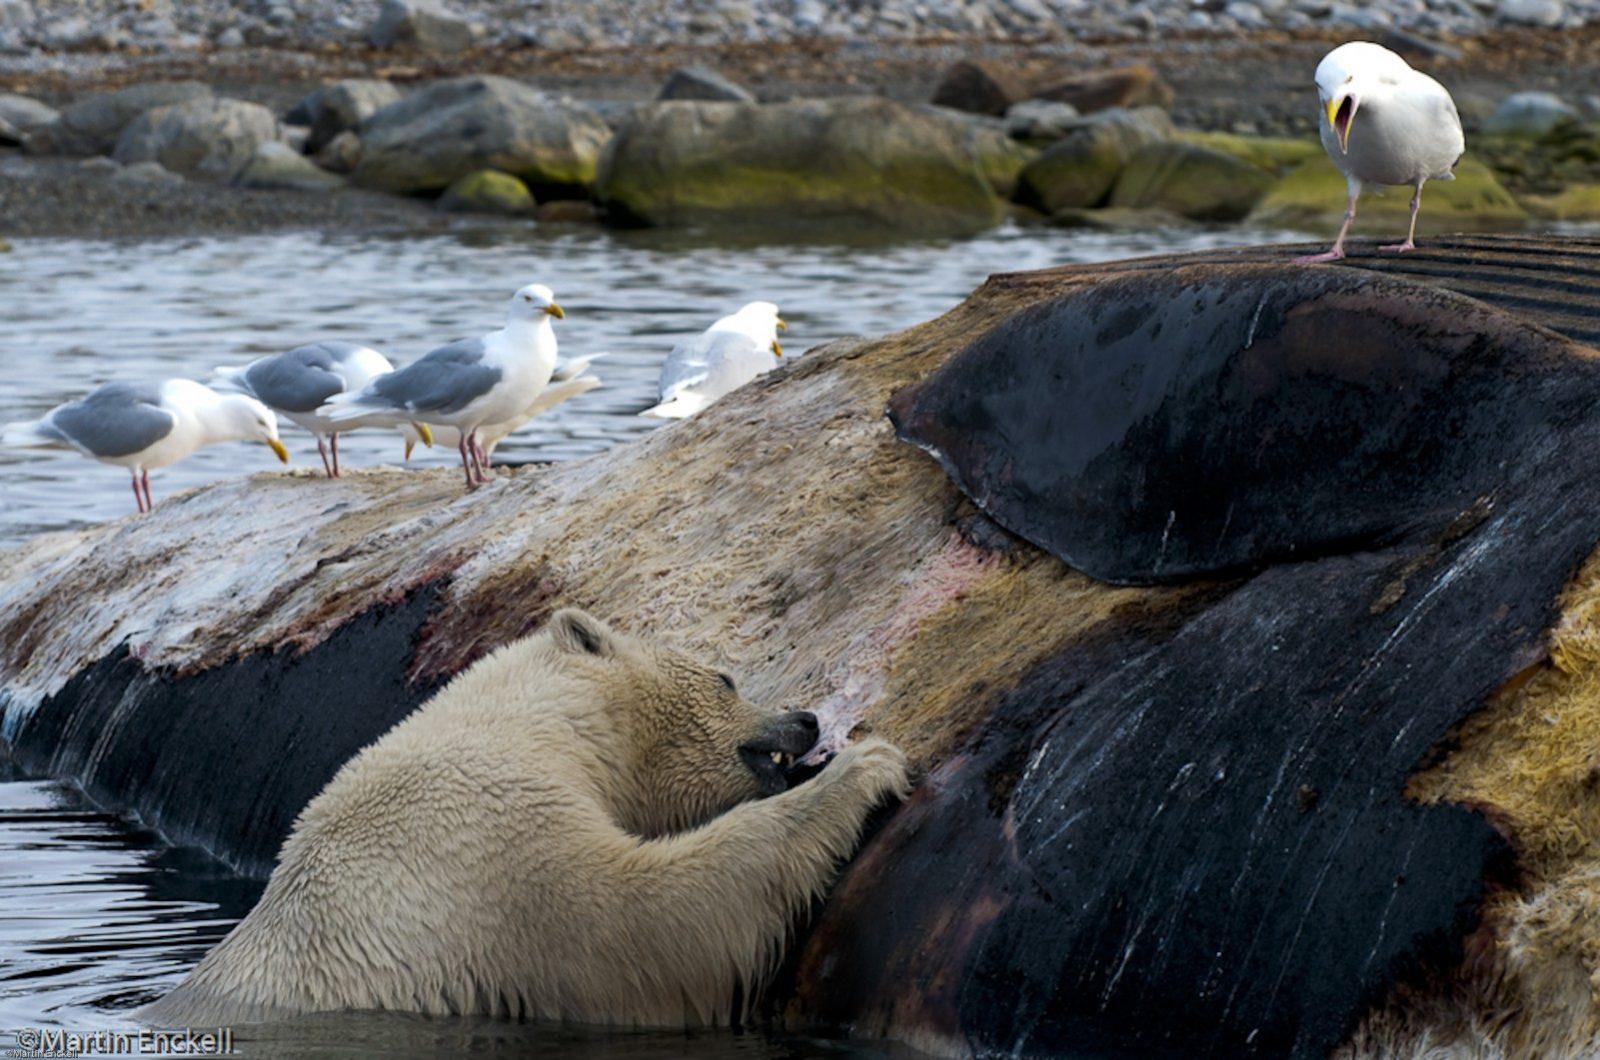 ©Martin Enckell, bear eating dead finwhale